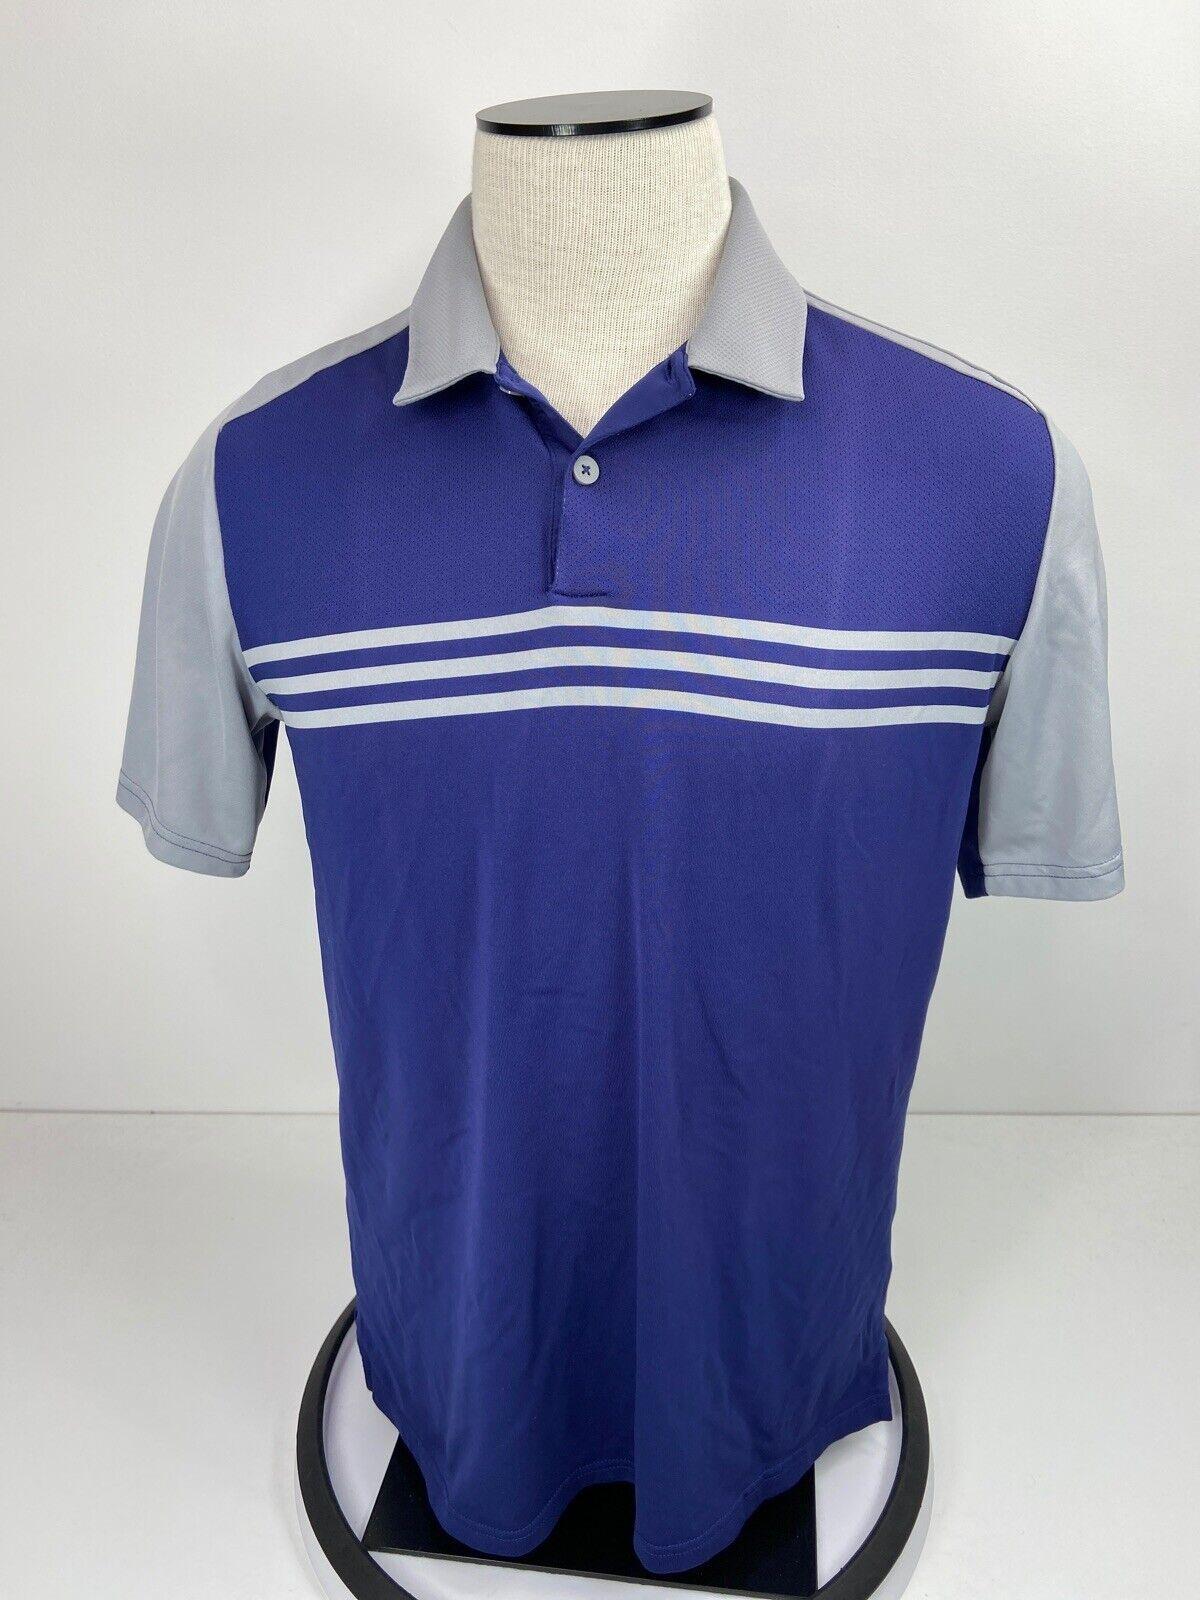 Adidas Men's Climacool Blue Gray Polo Shirt Size M - Gem